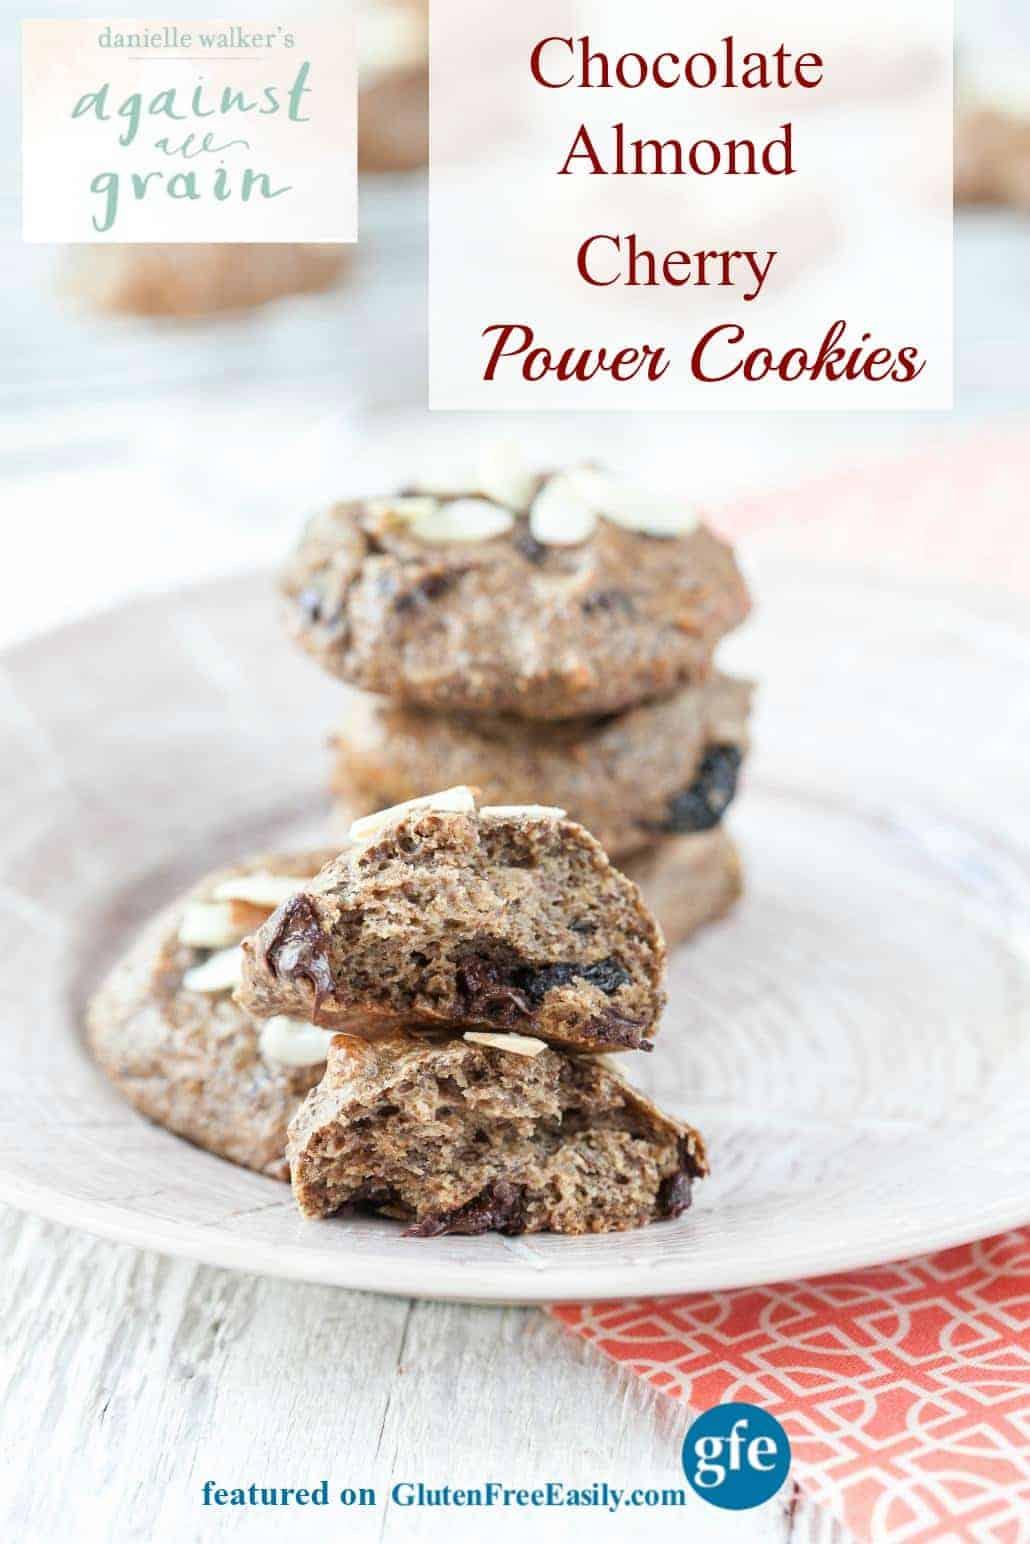 Grain-Free Chocolate Almond Cherry Power Cookie (Paleo Vegan) from Against All Grain [featured on GlutenFreeEasily.com]